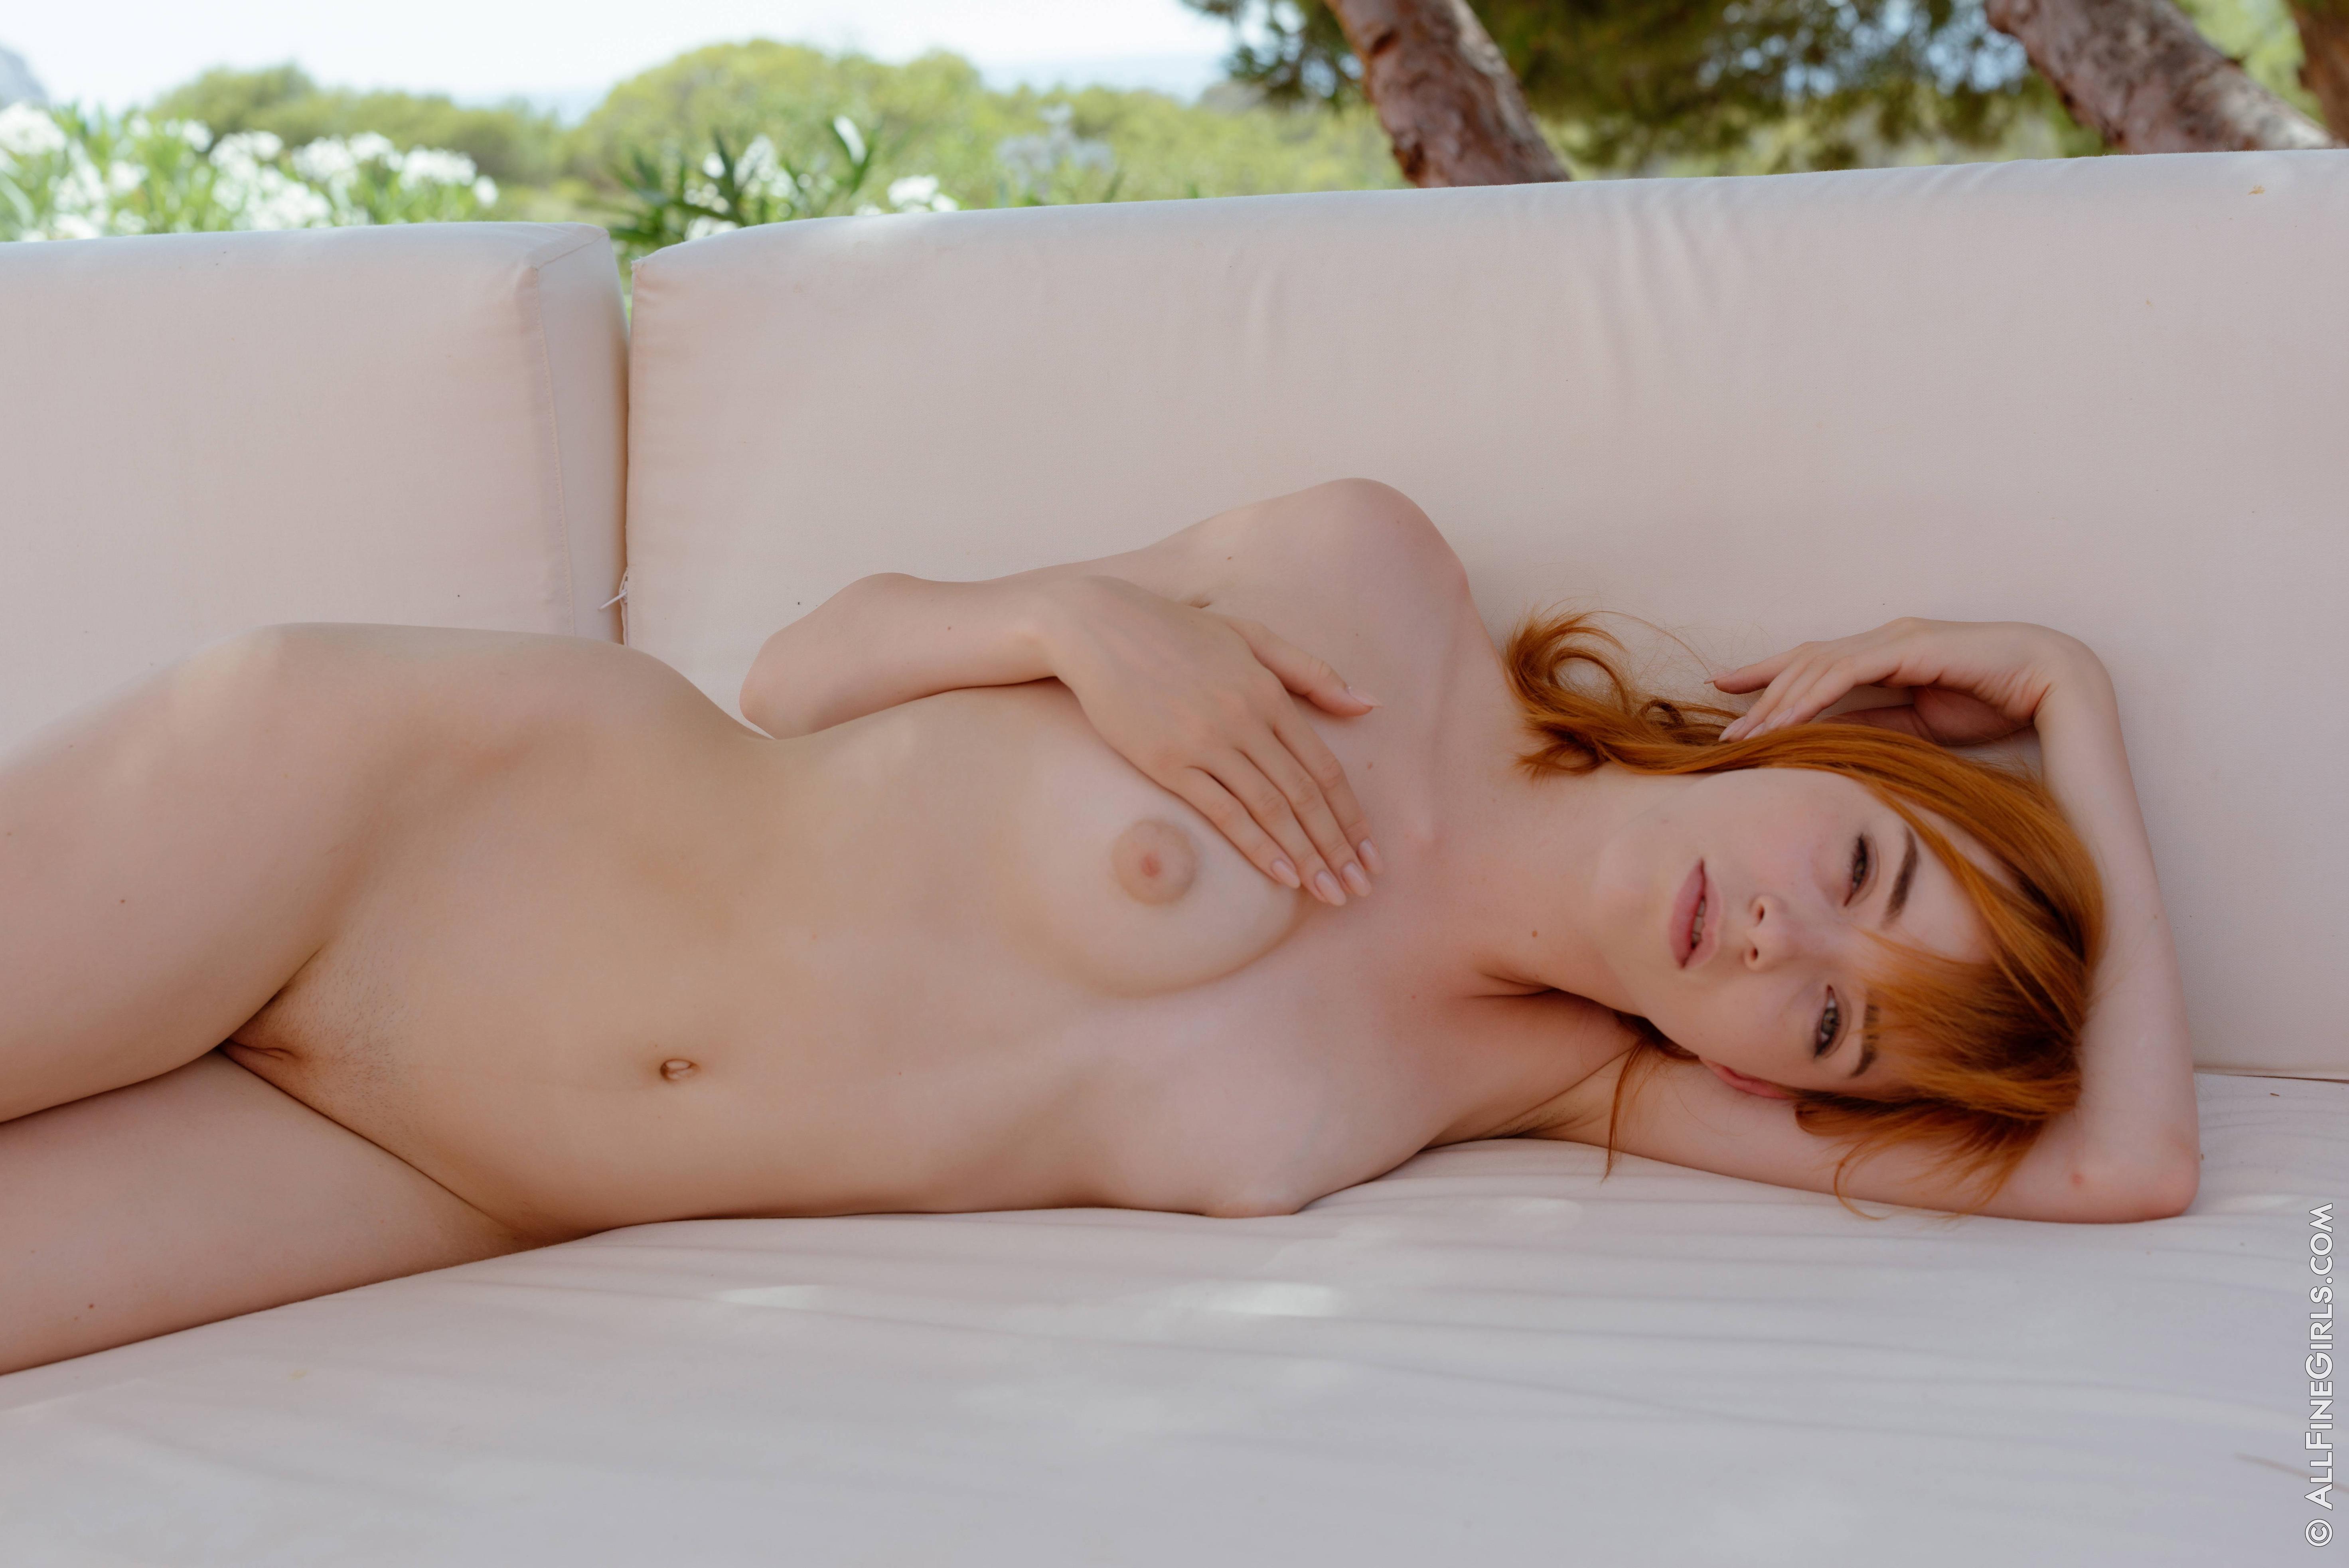 Anny Aurora Pornos